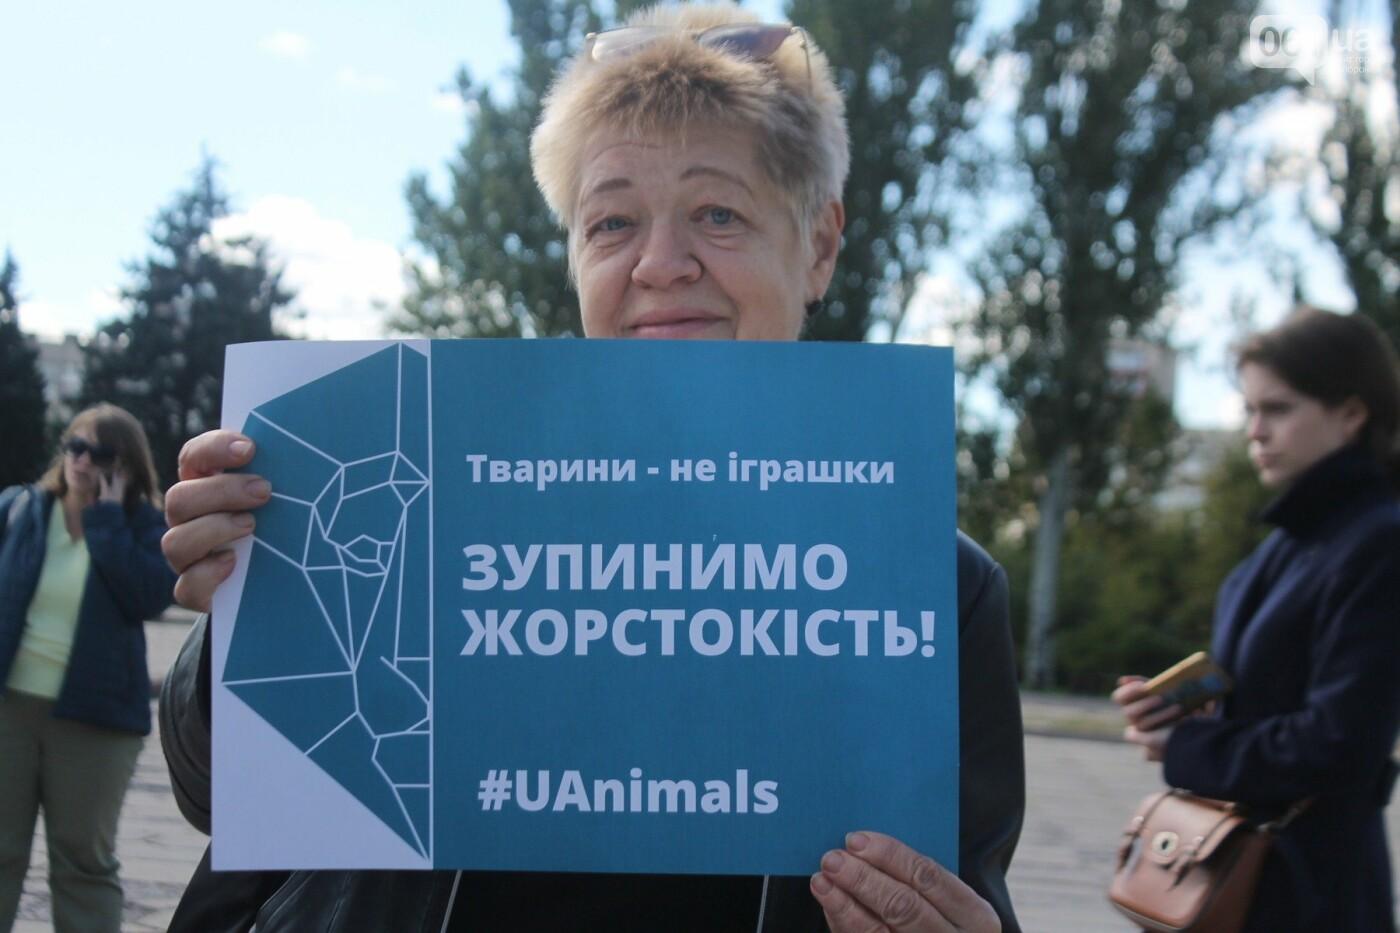 «Защити! Не мучай»: в Запорожье провели марш за права животных, – ФОТОРЕПОРТАЖ, ВИДЕО, фото-5